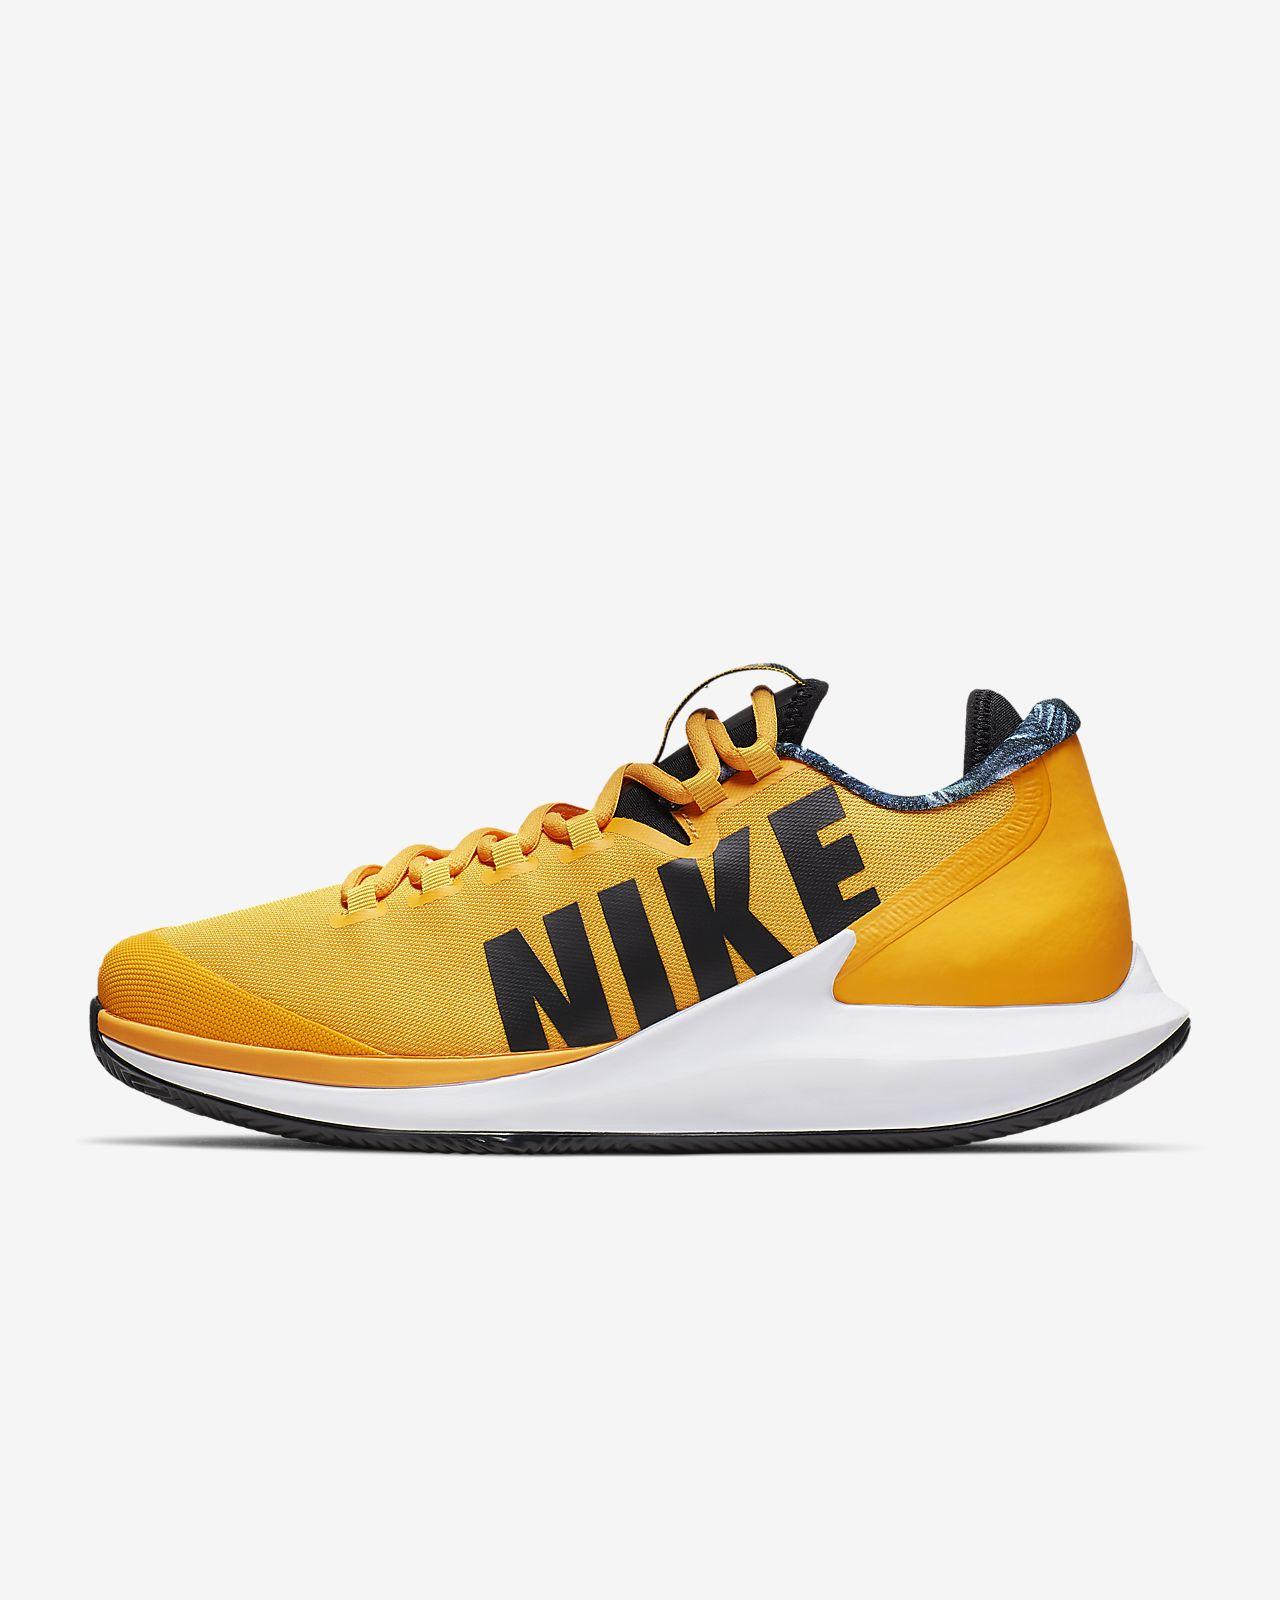 Scarpa da tennis per campi in terra rossa NikeCourt Air Zoom Zero - Uomo